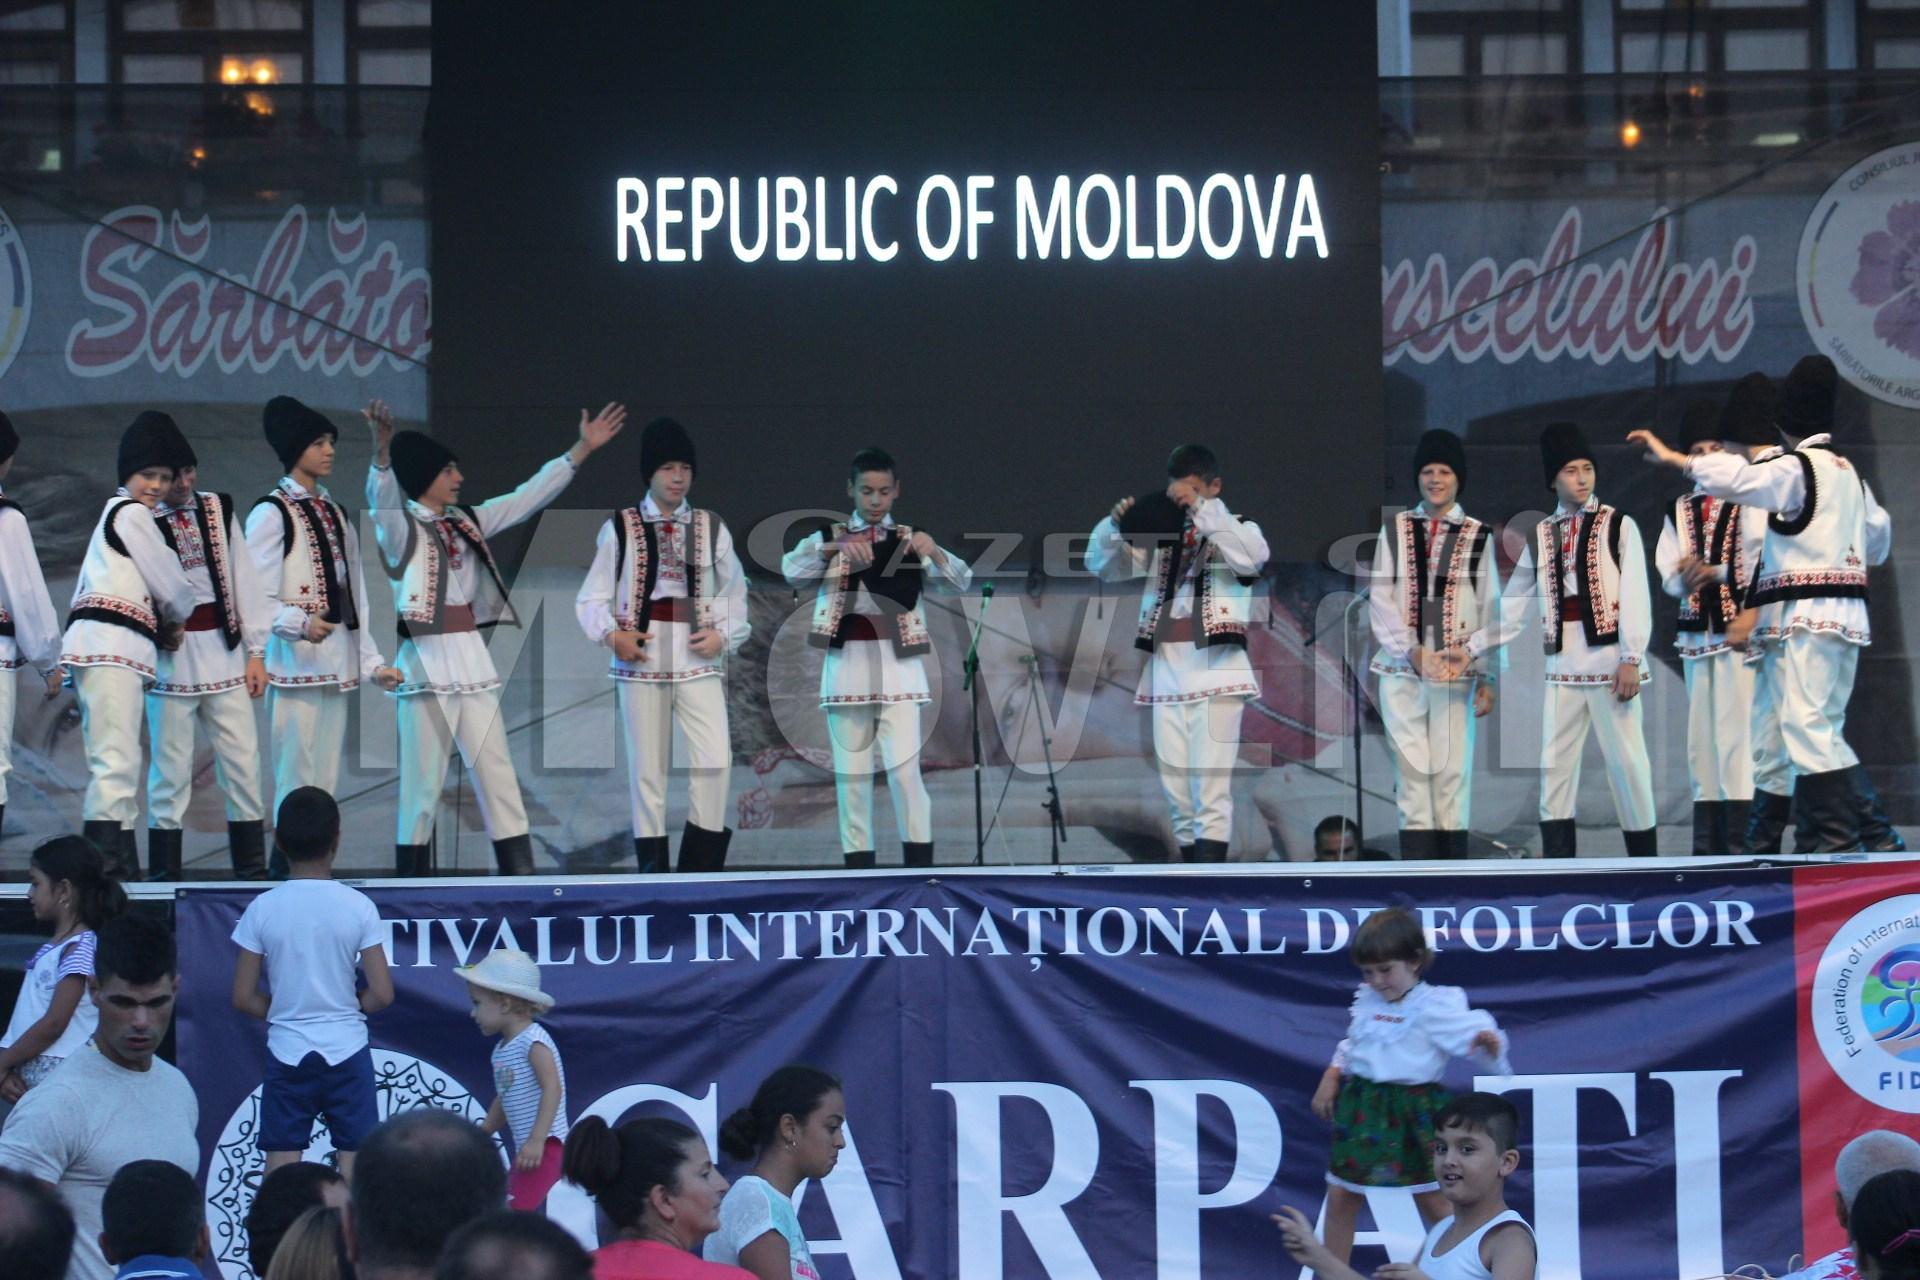 festivalul-carpati-mioveni-august-2017 (41)